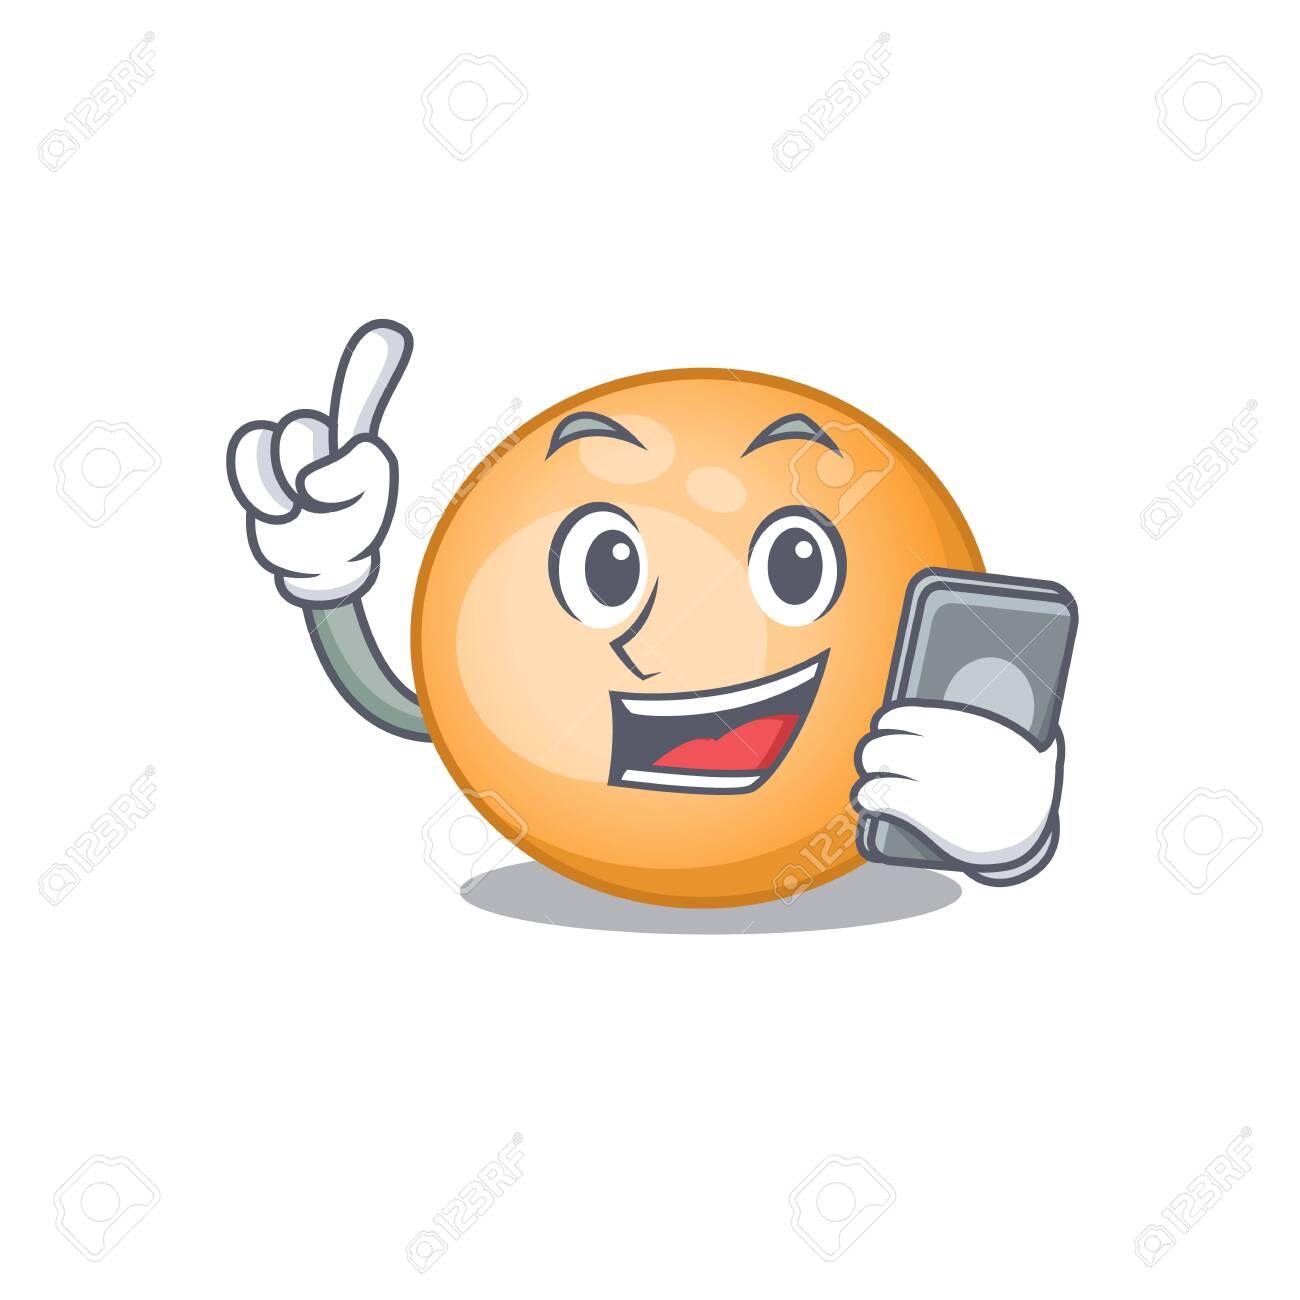 Staphylocuccus aureus cartoon character speaking on phone - 146740406